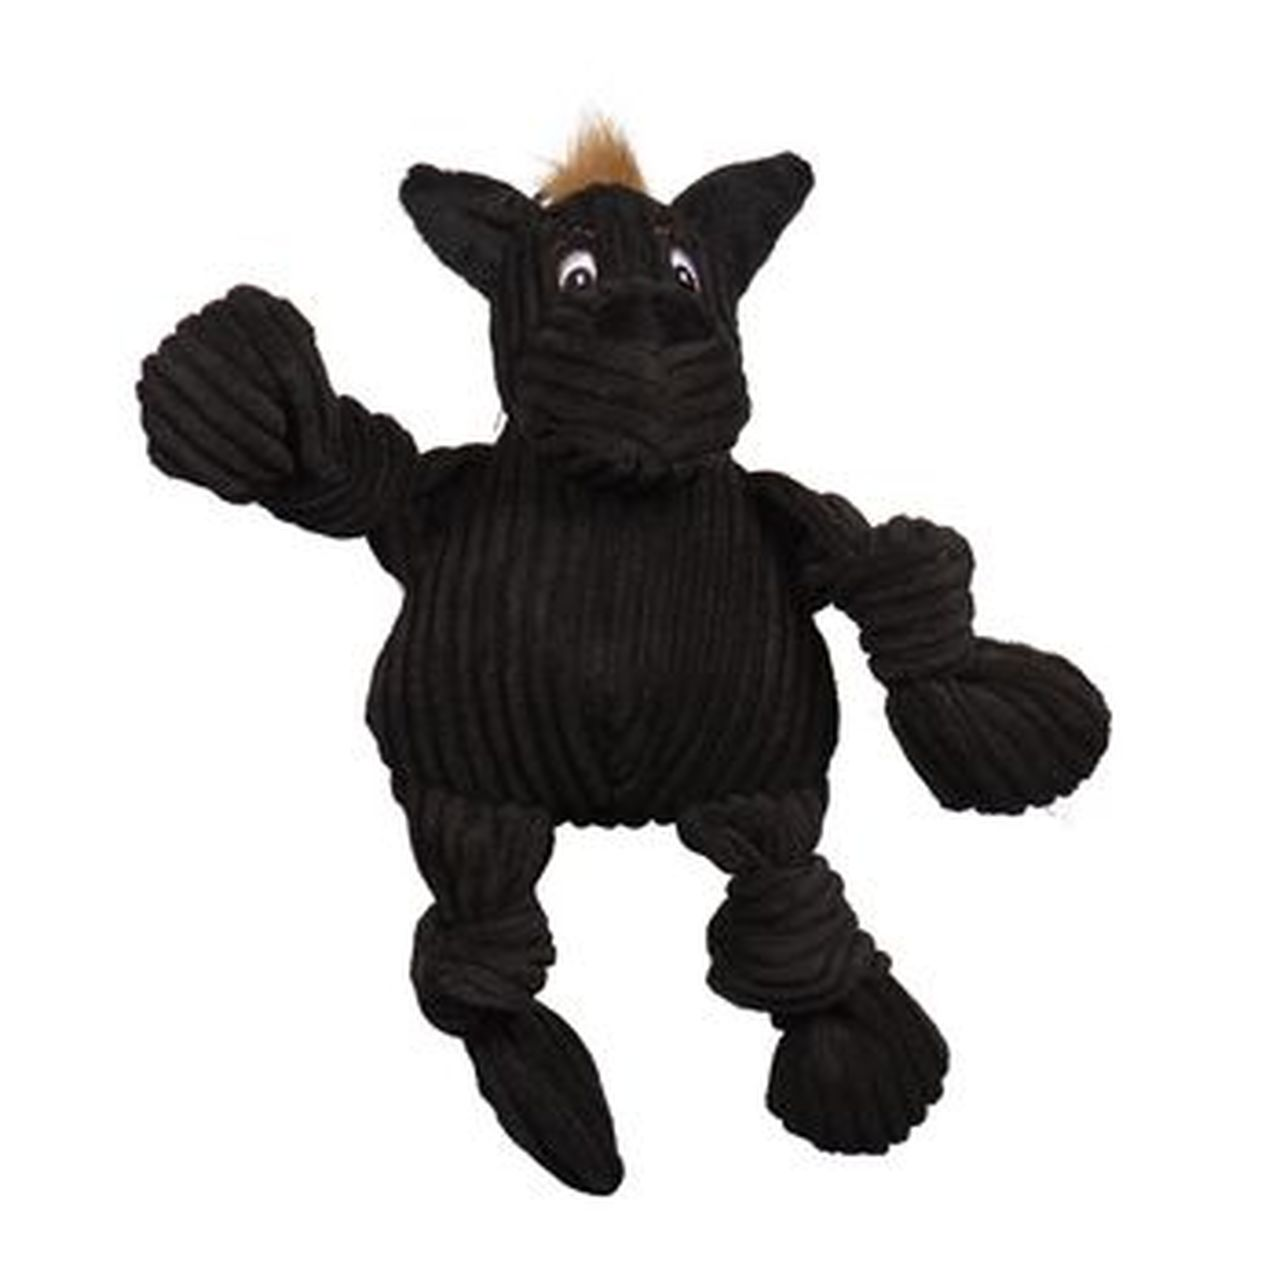 HuggleHounds Knottie HuggleMutt Tiny Dog Toy, Small